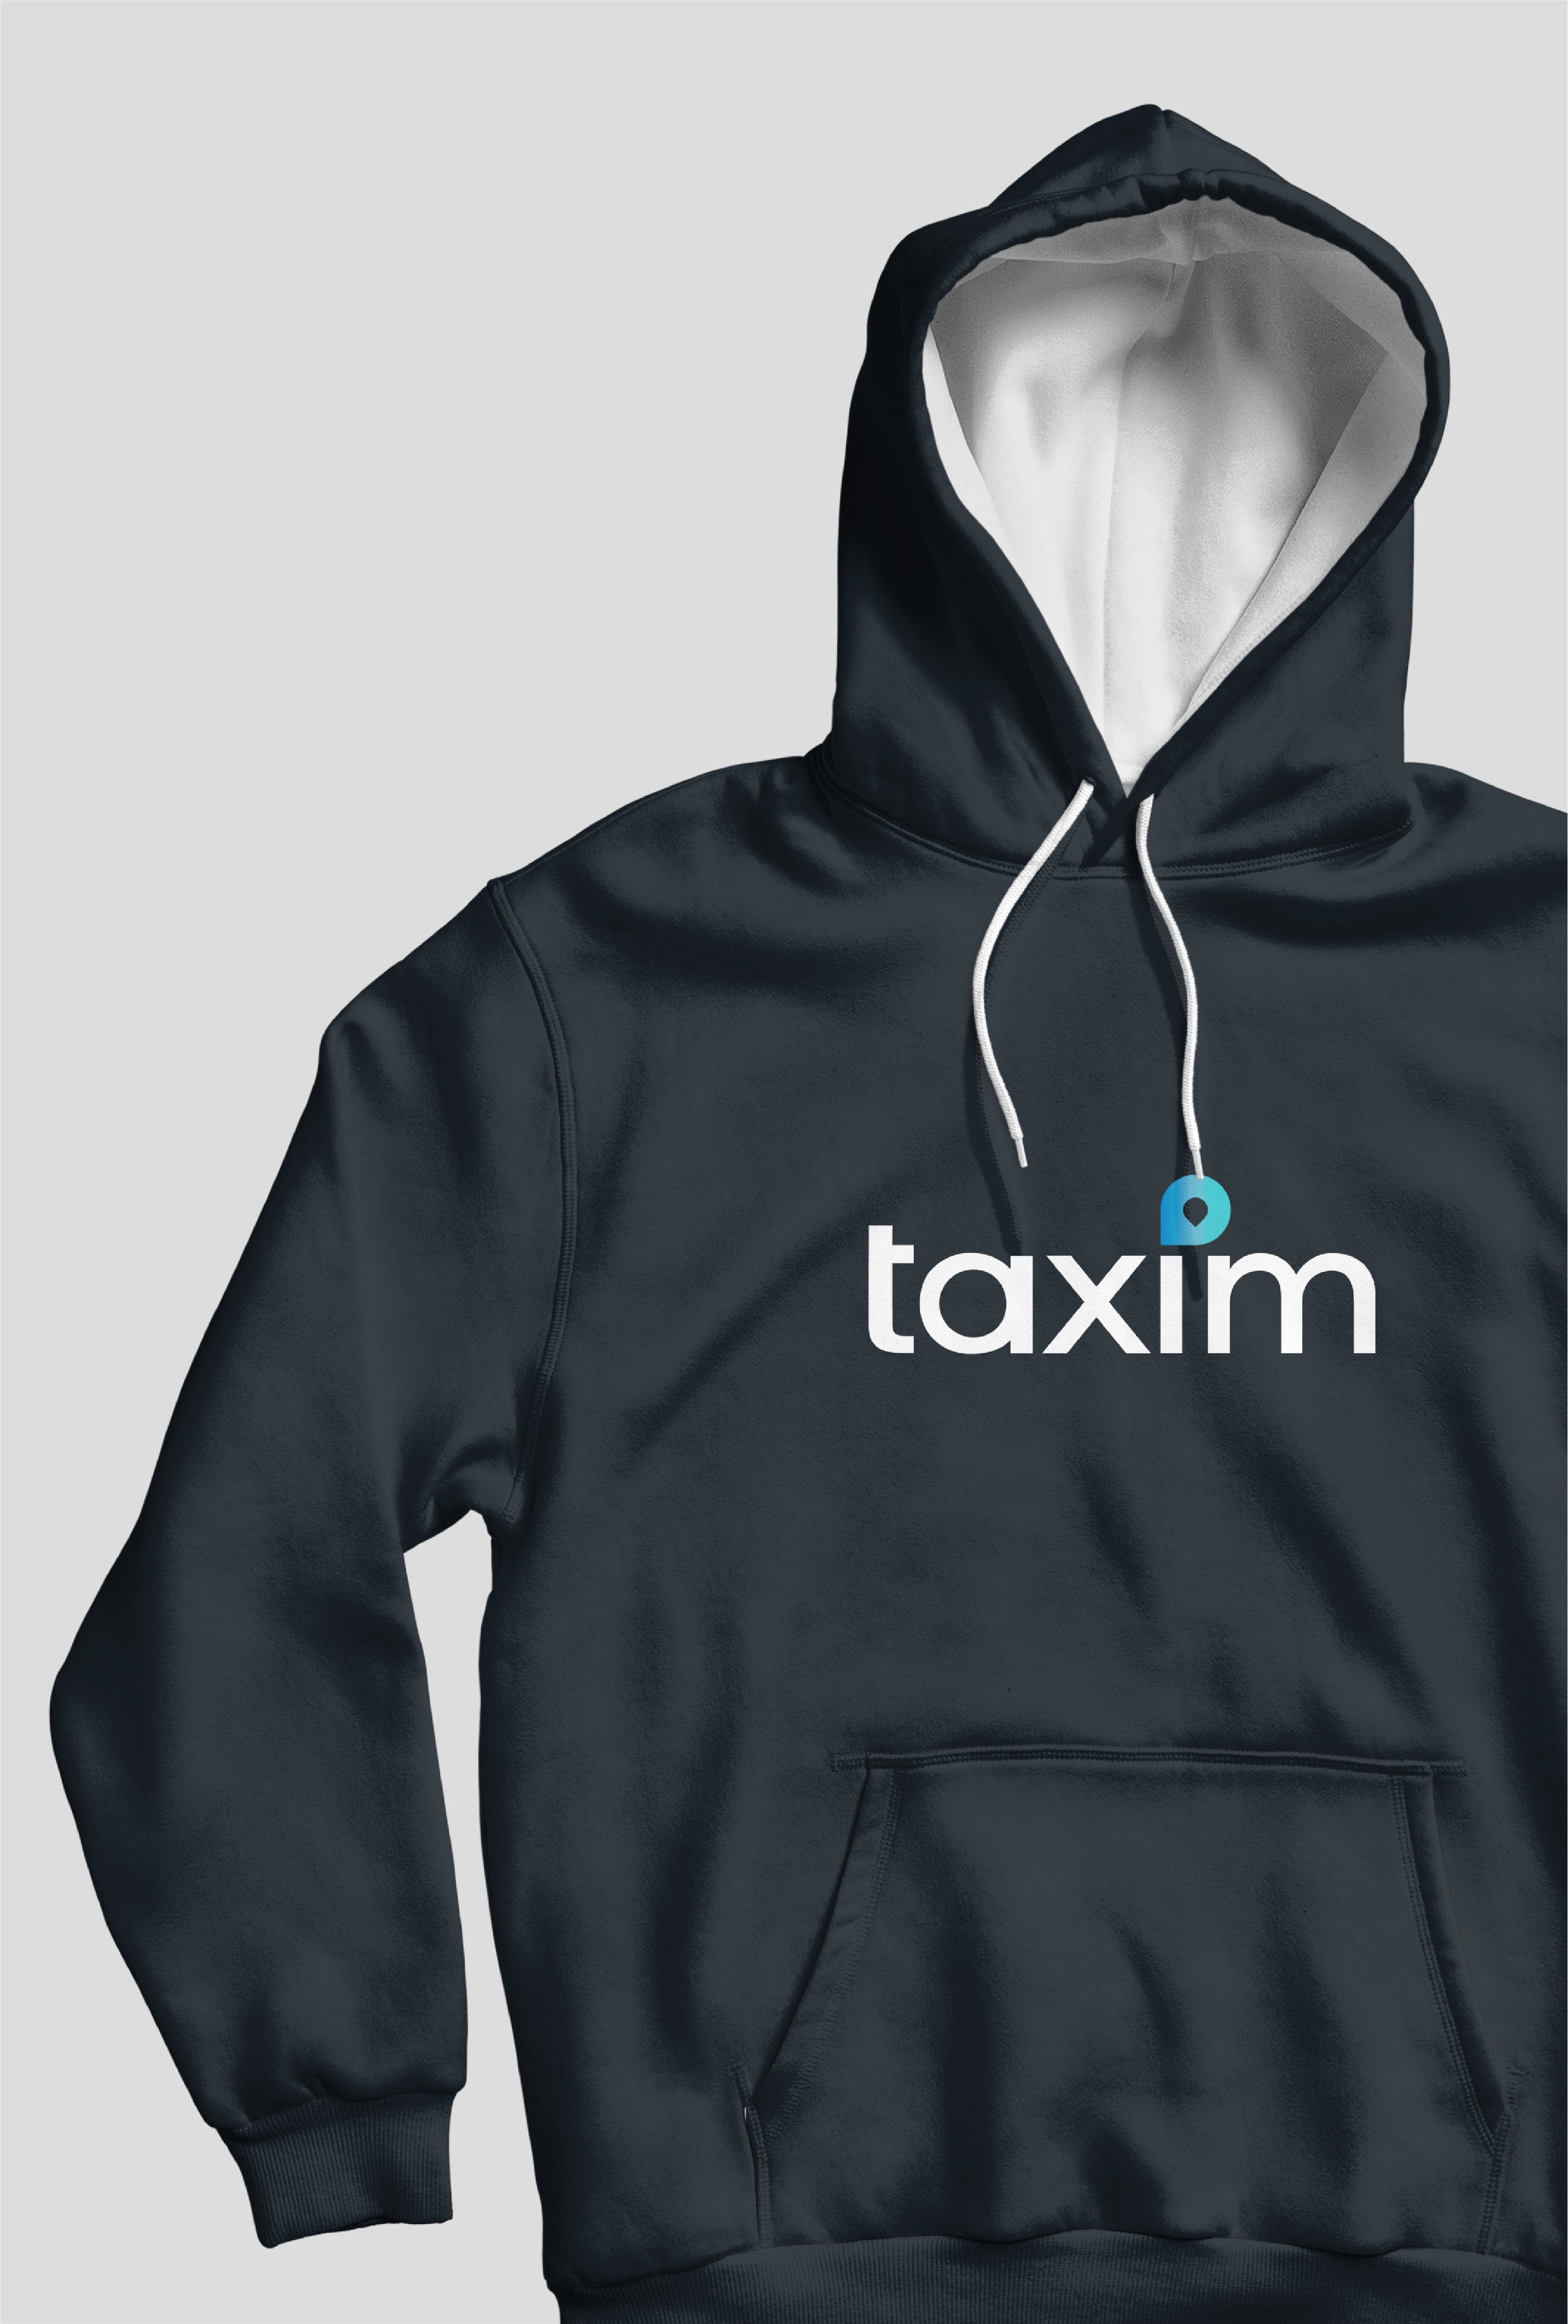 taxim_behance_project1-21.jpg